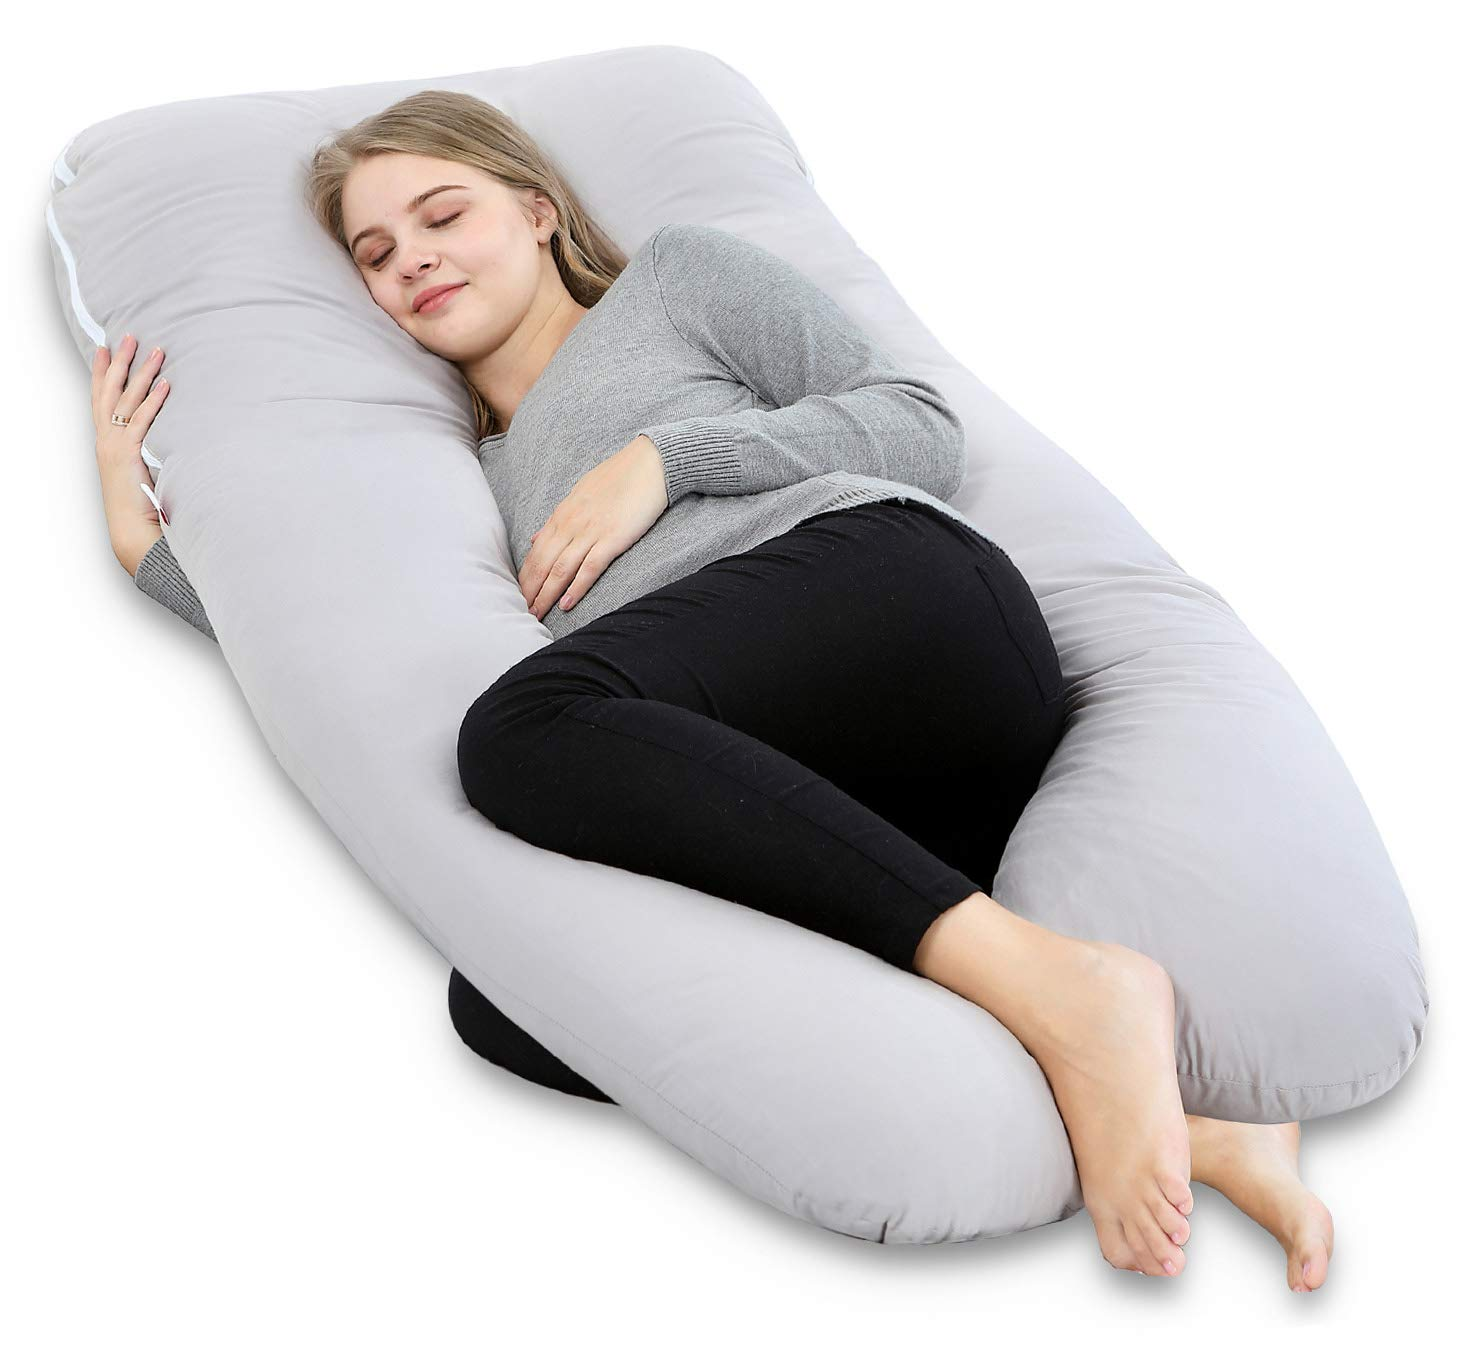 Bedding & Linens SL BIG C-U Shaped Full Body & BACK SUPPORT PILLOW U-Shaped Pregnancy Maternity Pillow Free Pillow Case